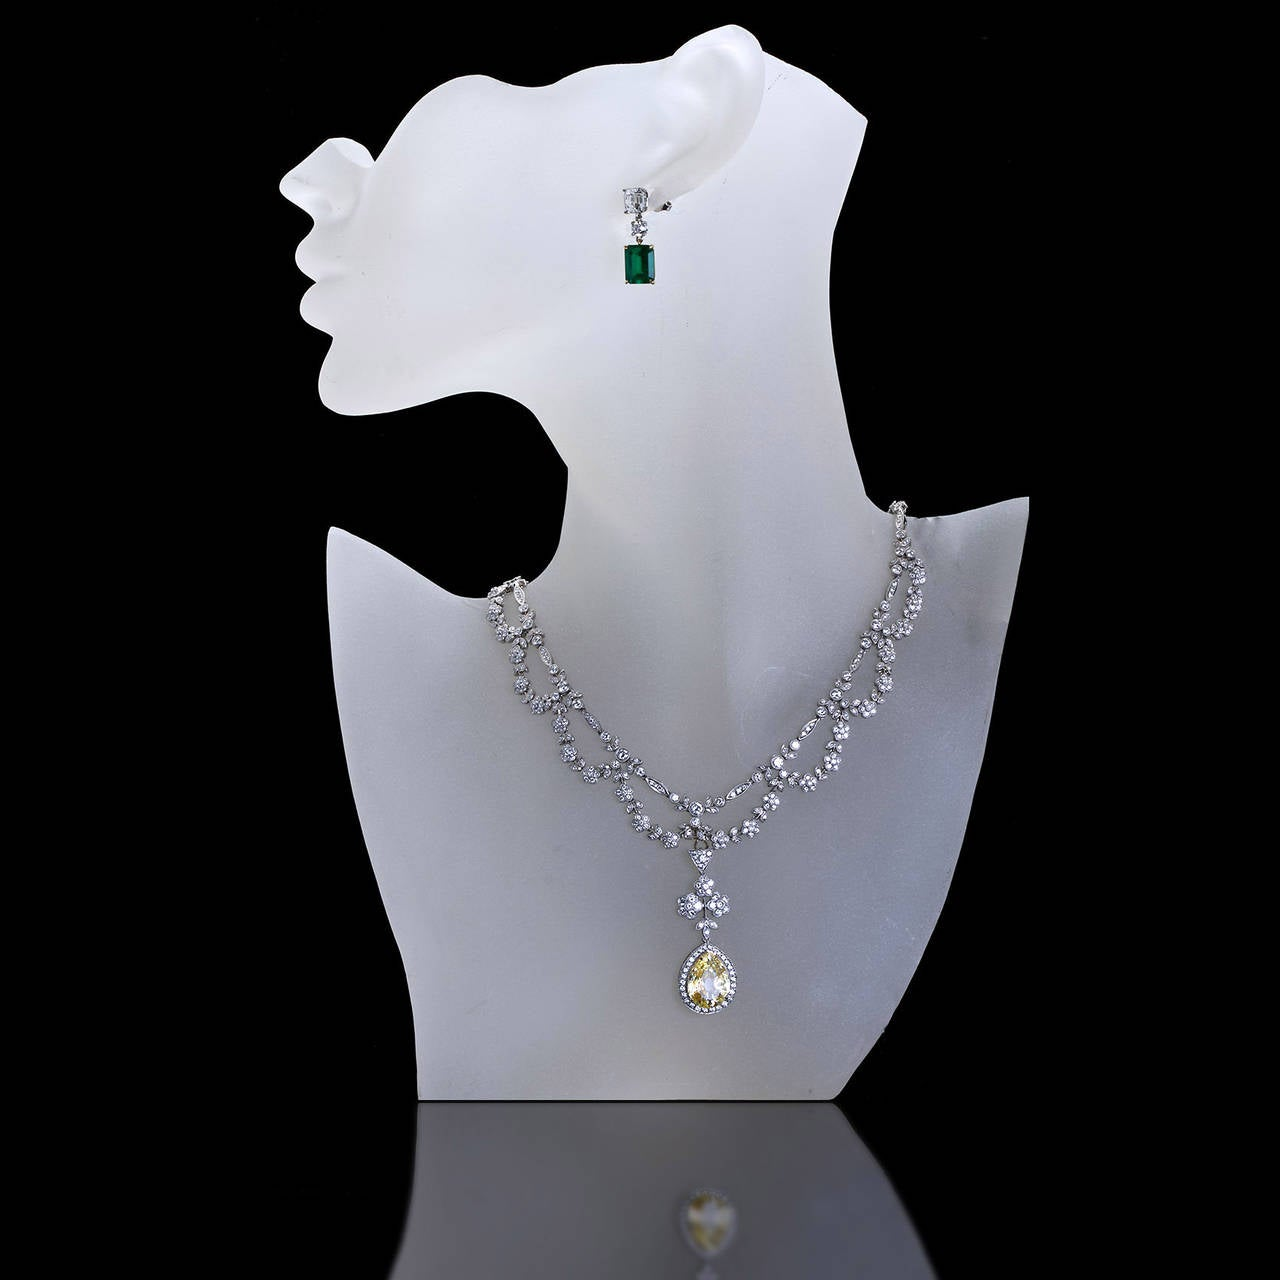 Antique  5.06 Carat Fancy Yellow Pear Shaped Diamond Drape Necklace 6